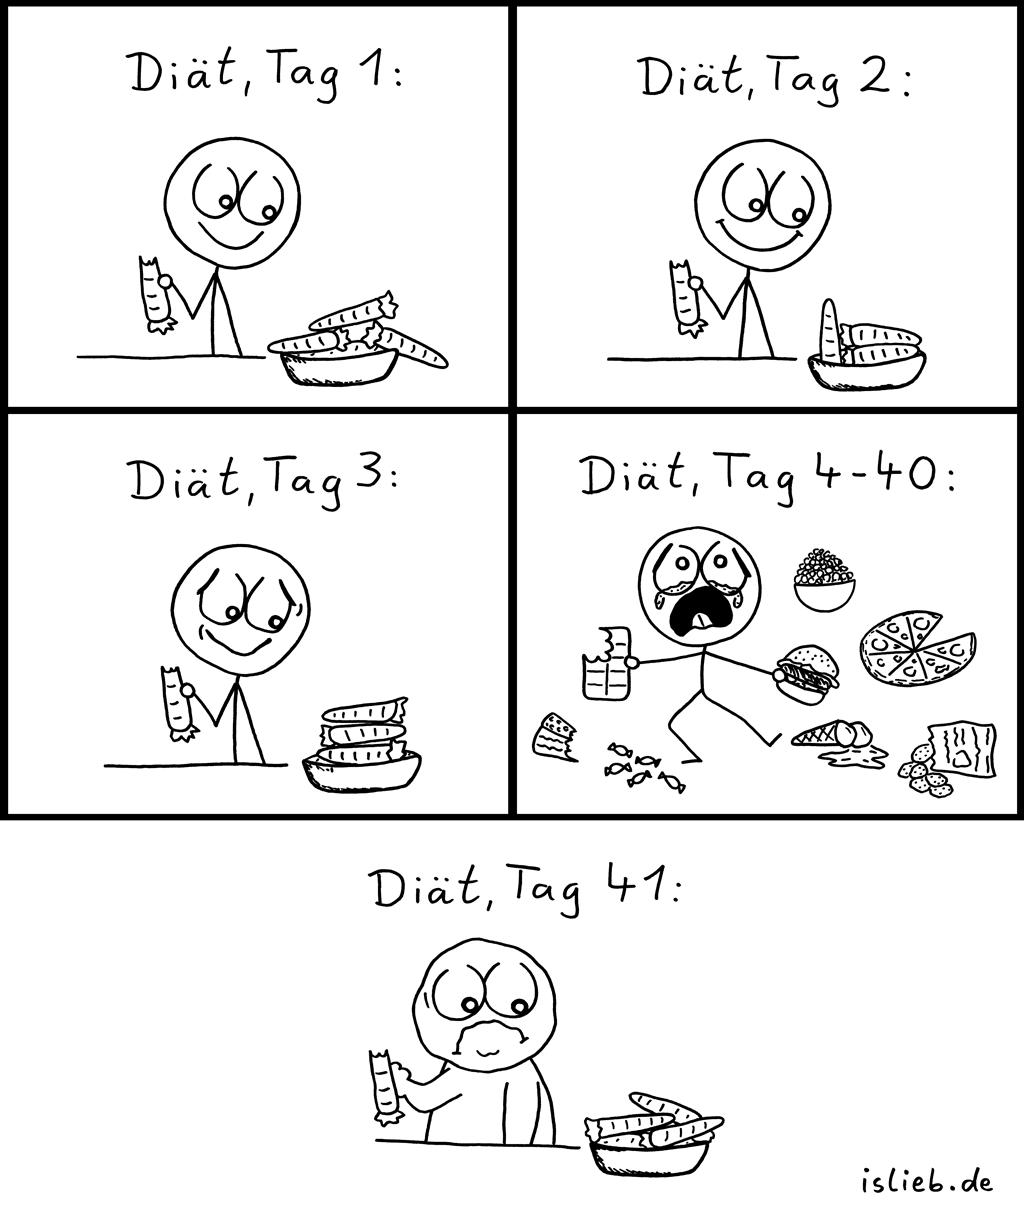 Diät | Möhren-Comic | is lieb? | Diät, Tag 1, Tag 2, Tag 3, Tag 4-40, tag 41 | Karotten, essen, abnehmen, Fressflash, Gewicht